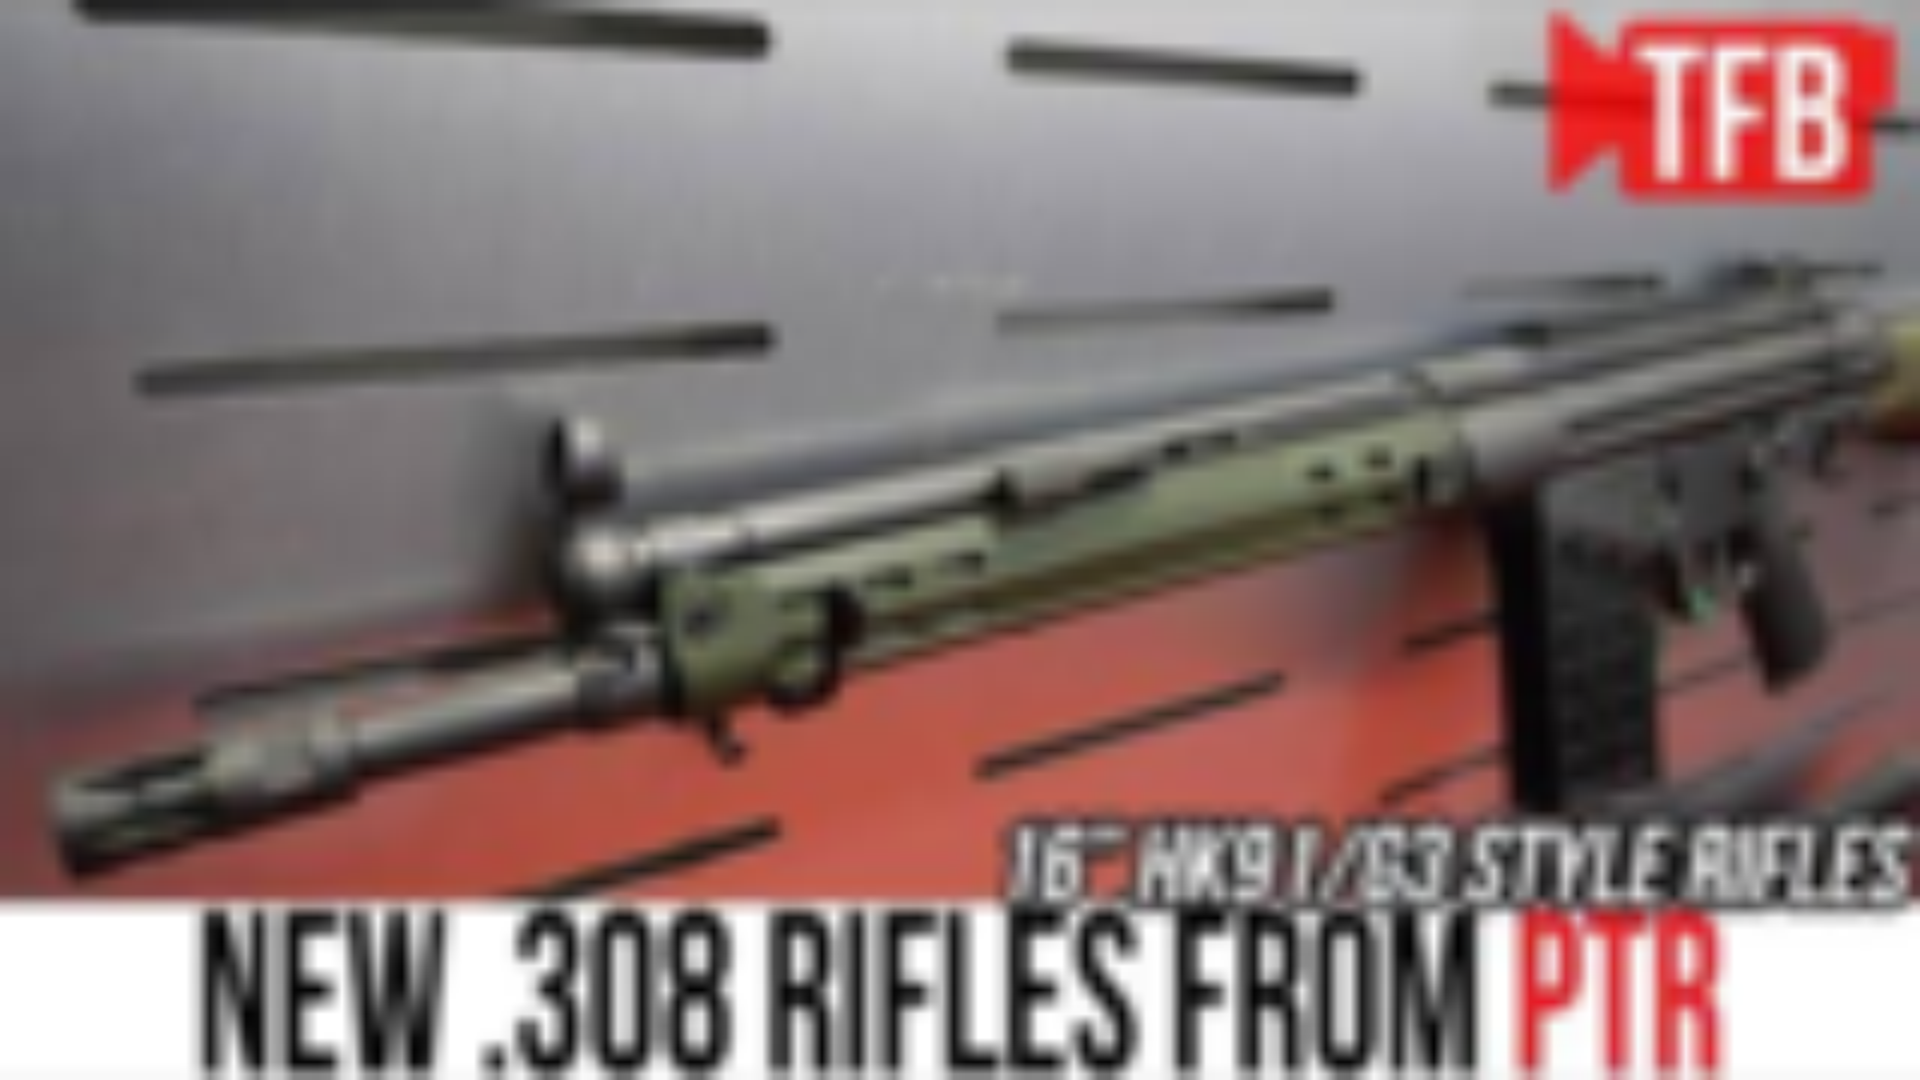 [TFB]新RTR-91系列HK91/G3步枪